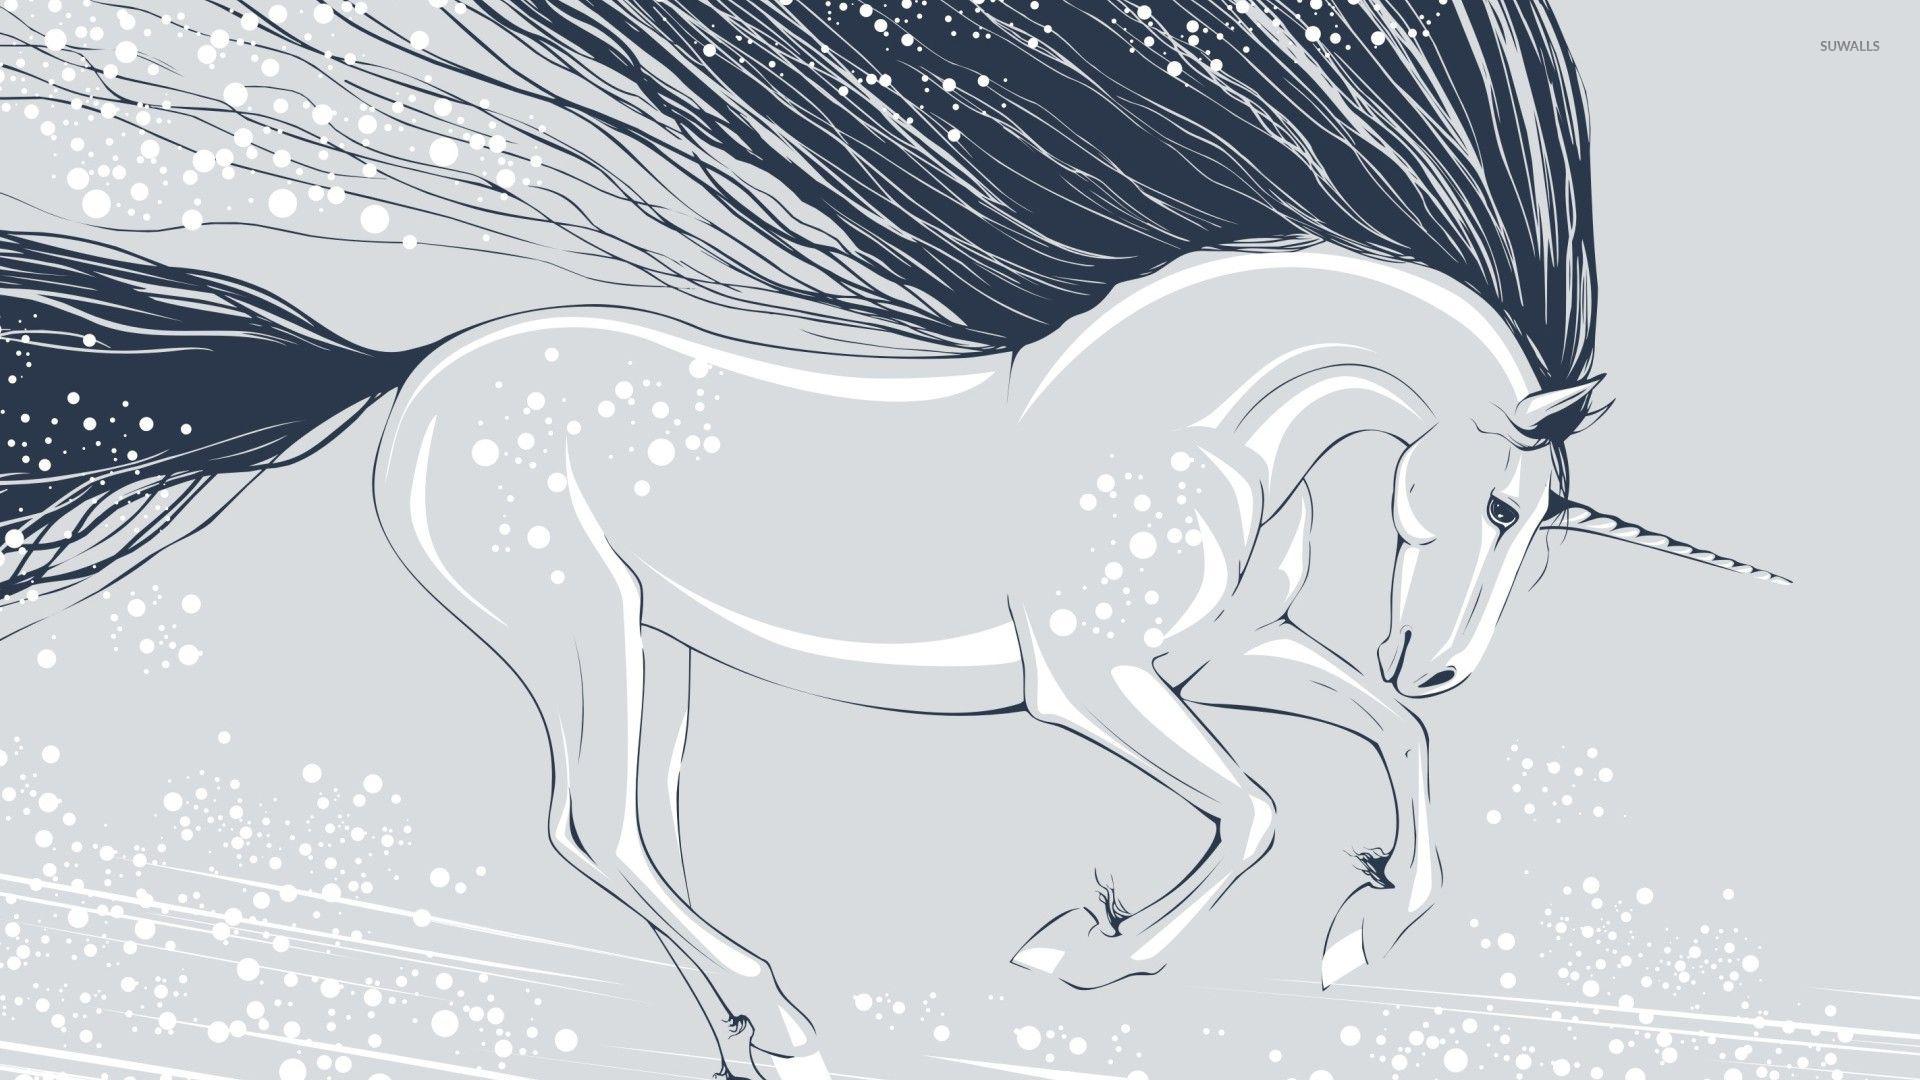 Good Wallpaper Halloween Unicorn - unicorn-22074-1920x1080  Collection_871492.jpg